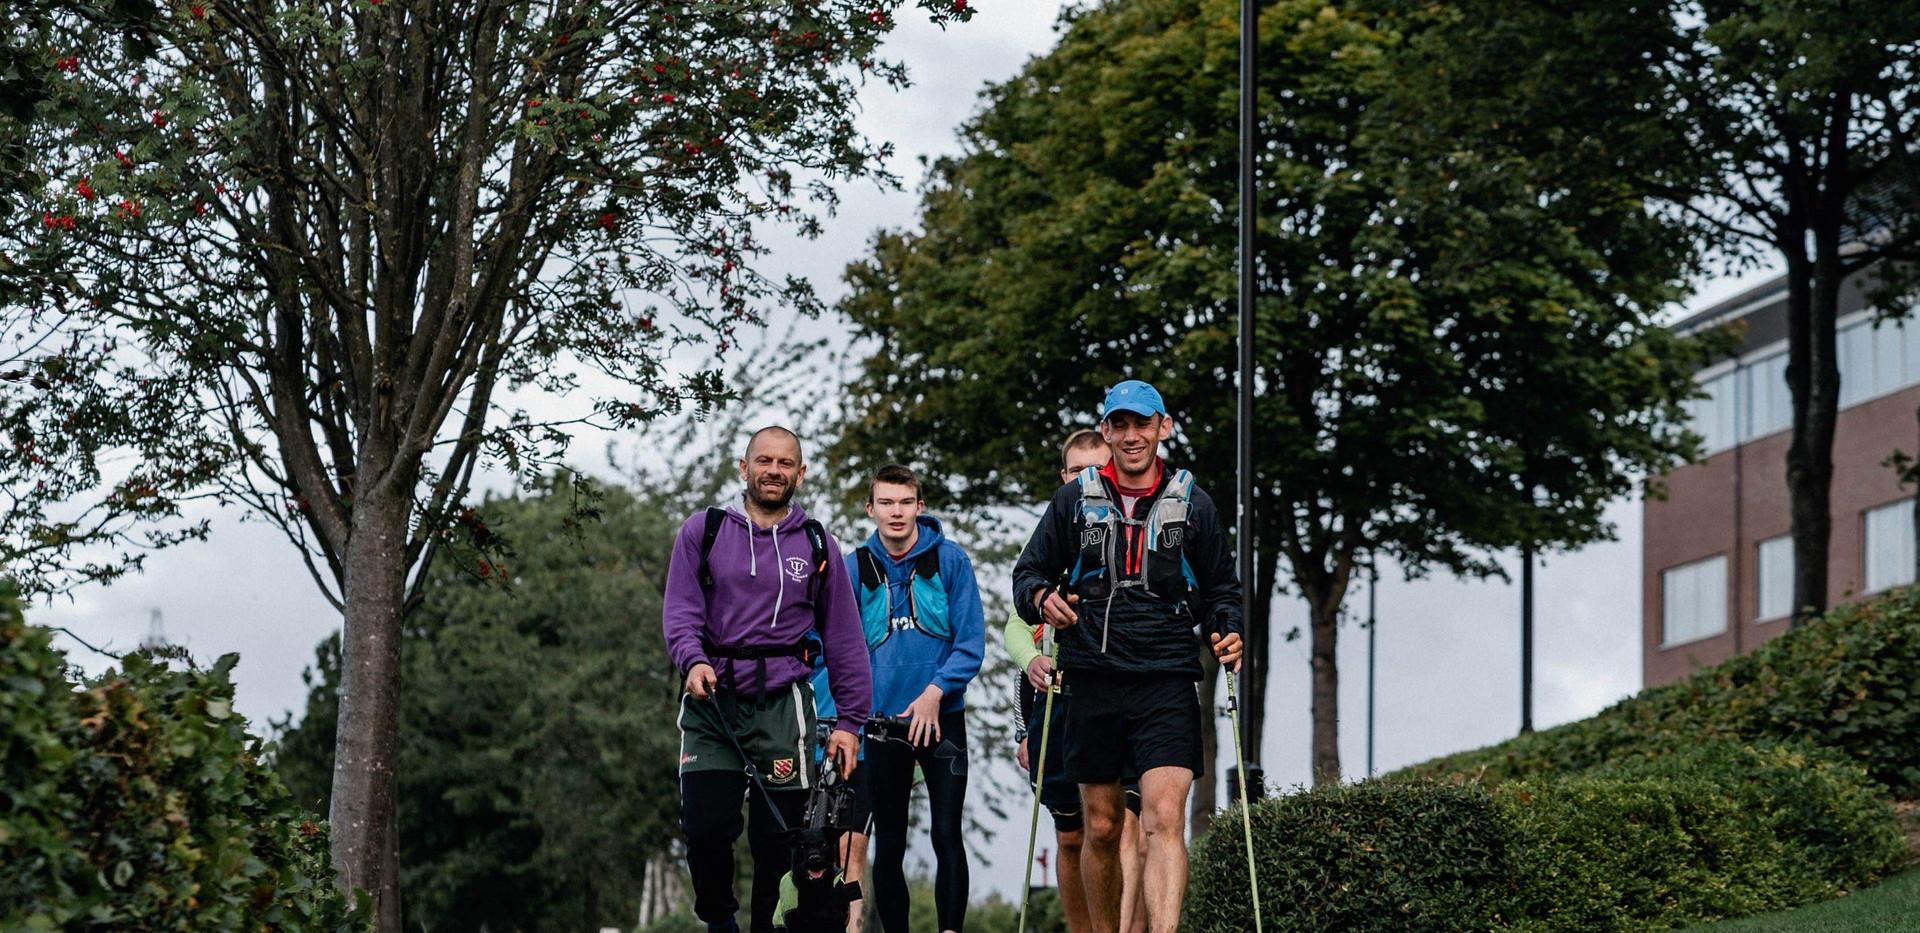 Molly Leading the Way Along the Tyne